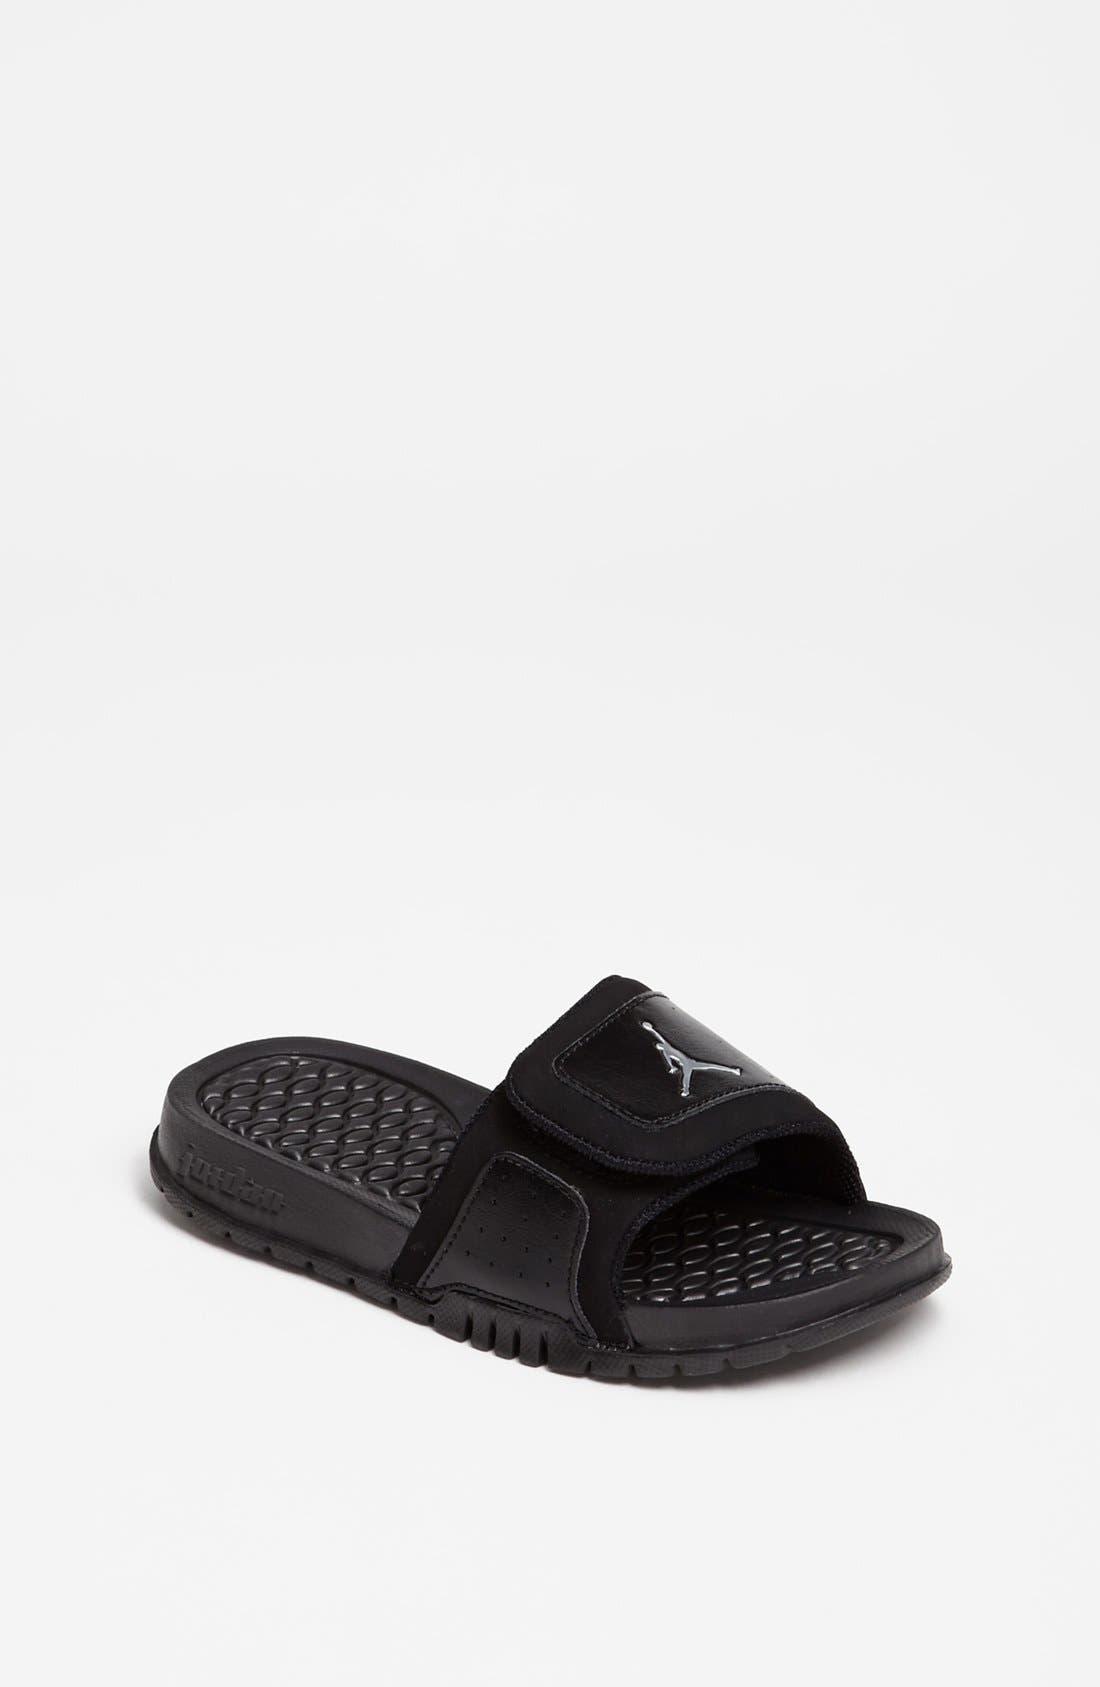 Alternate Image 1 Selected - Nike 'Jordan Hydro II' Sandal (Toddler & Little Kid)